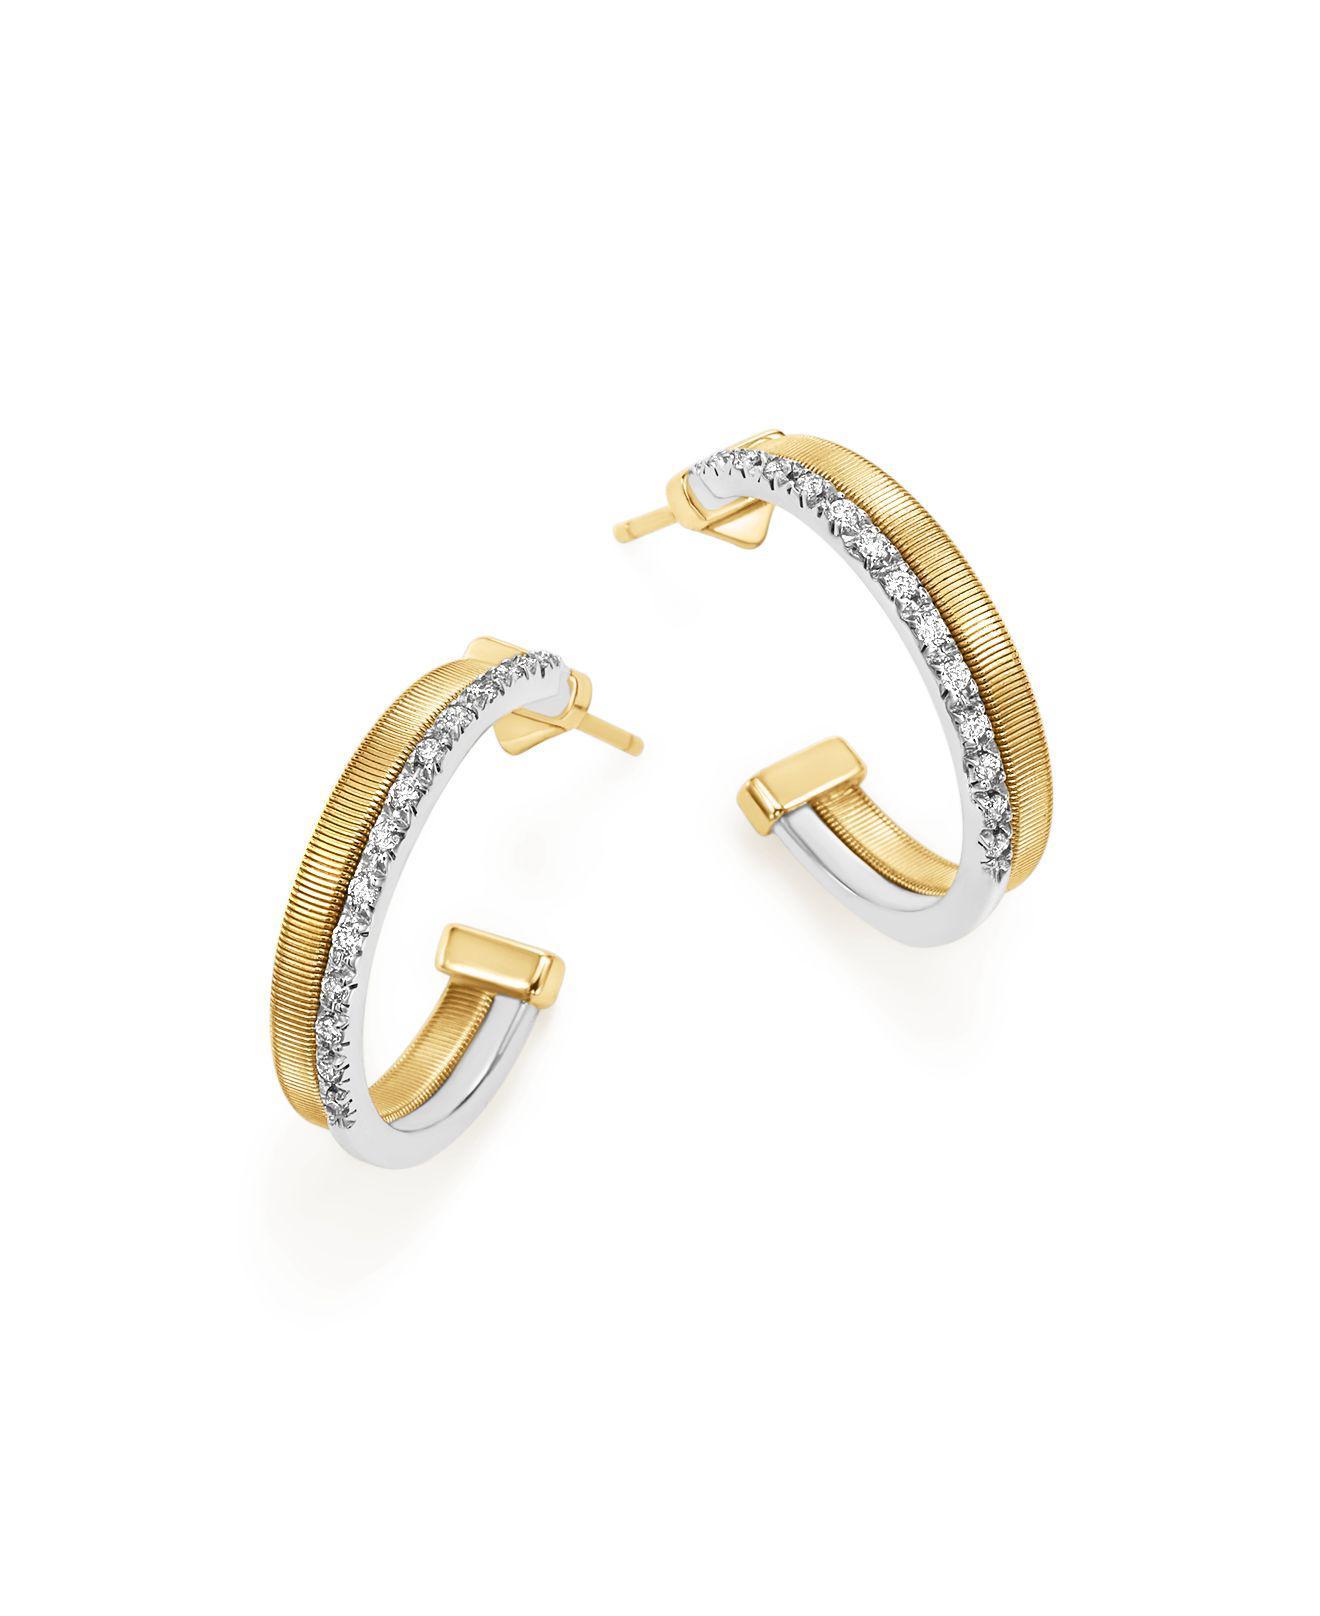 Marco Bicego Masai 18K White & Yellow Gold Hoop Earrings with Diamonds ps4xTj